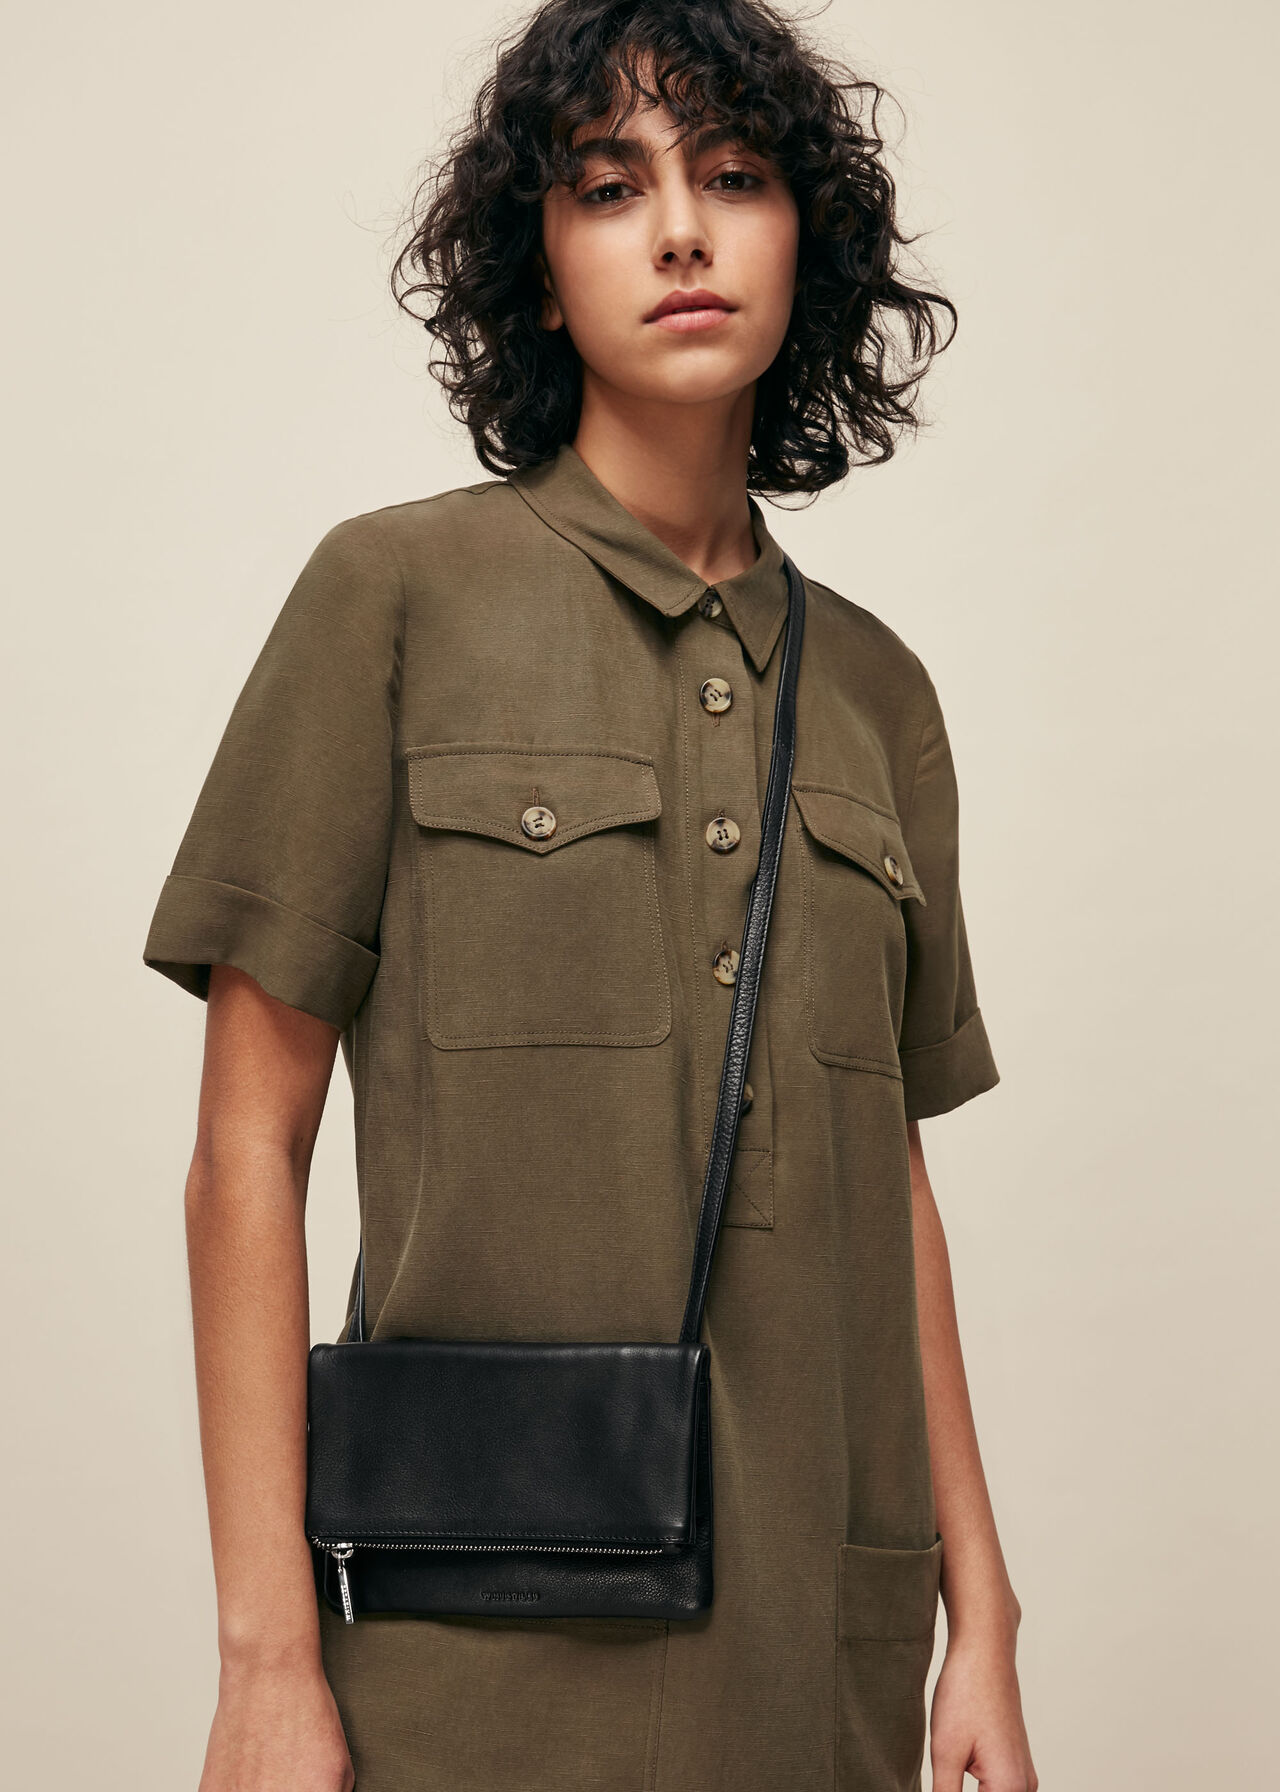 Issy Mini Foldover Bag Black